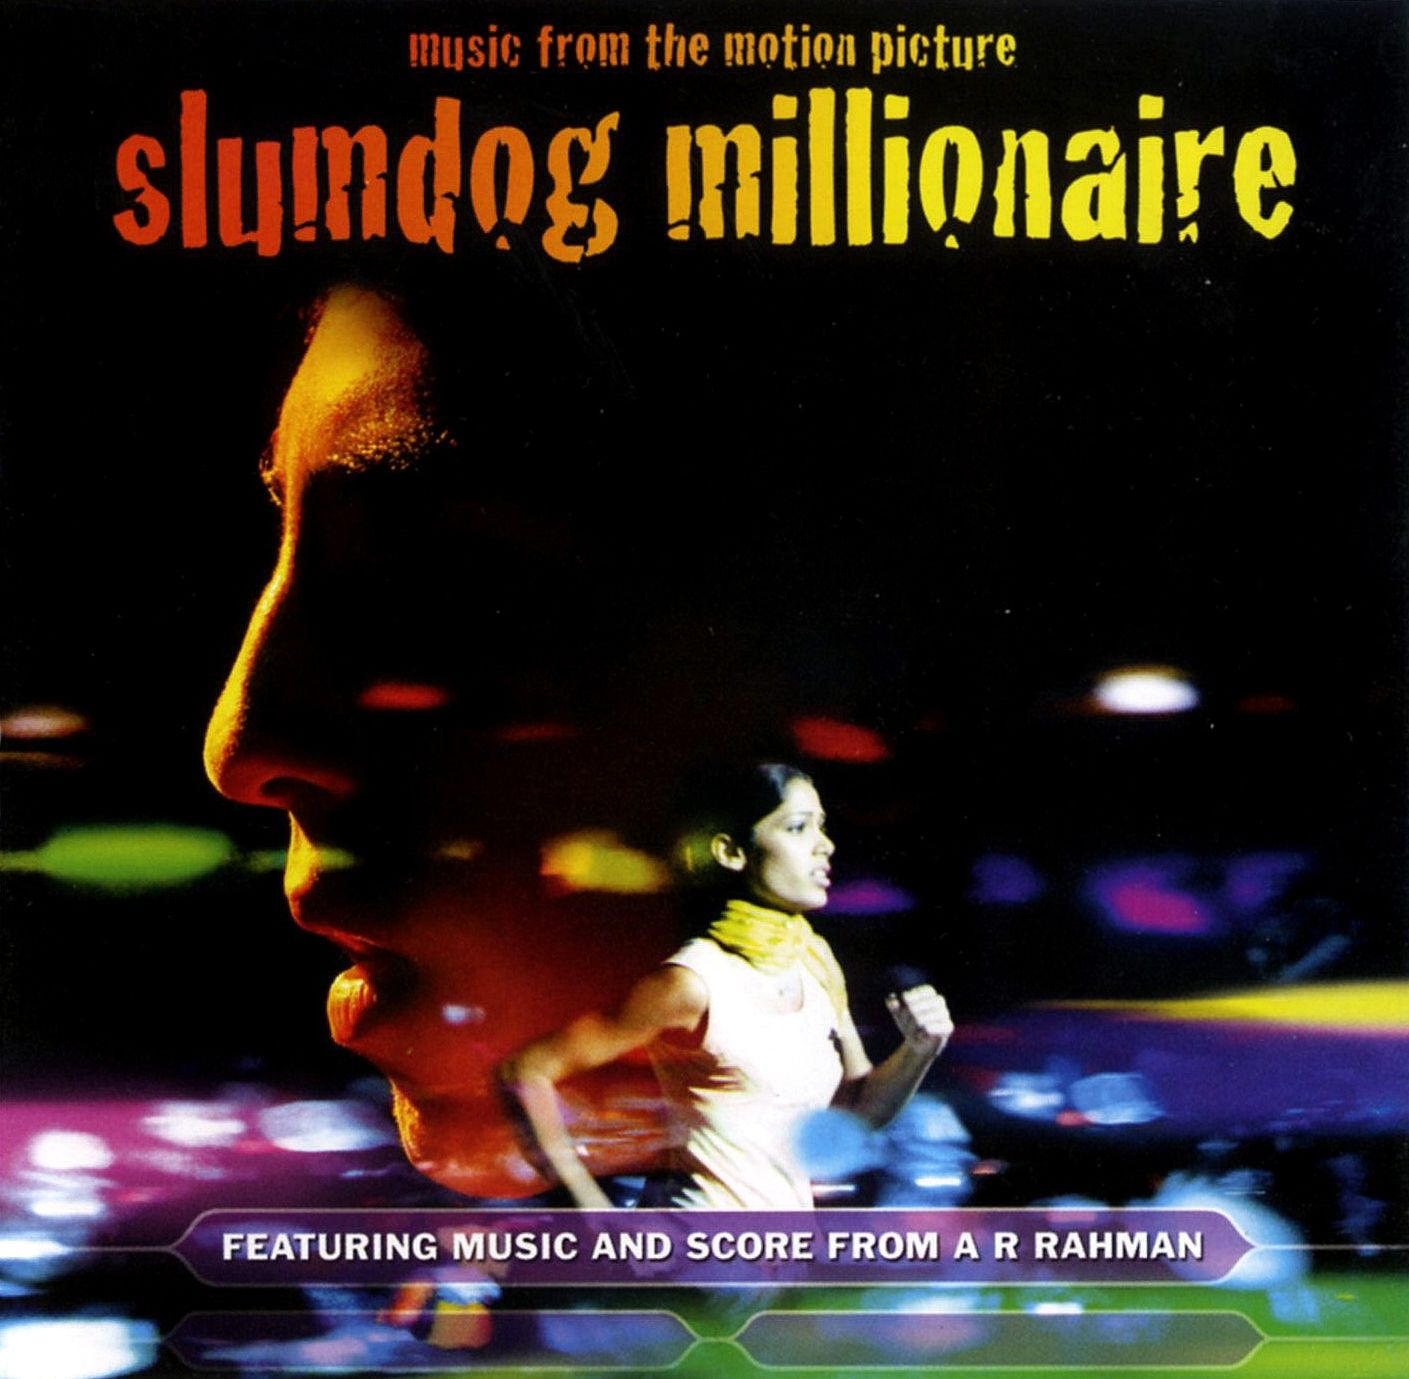 Soundtrack - Slumdog Millionaire album cover